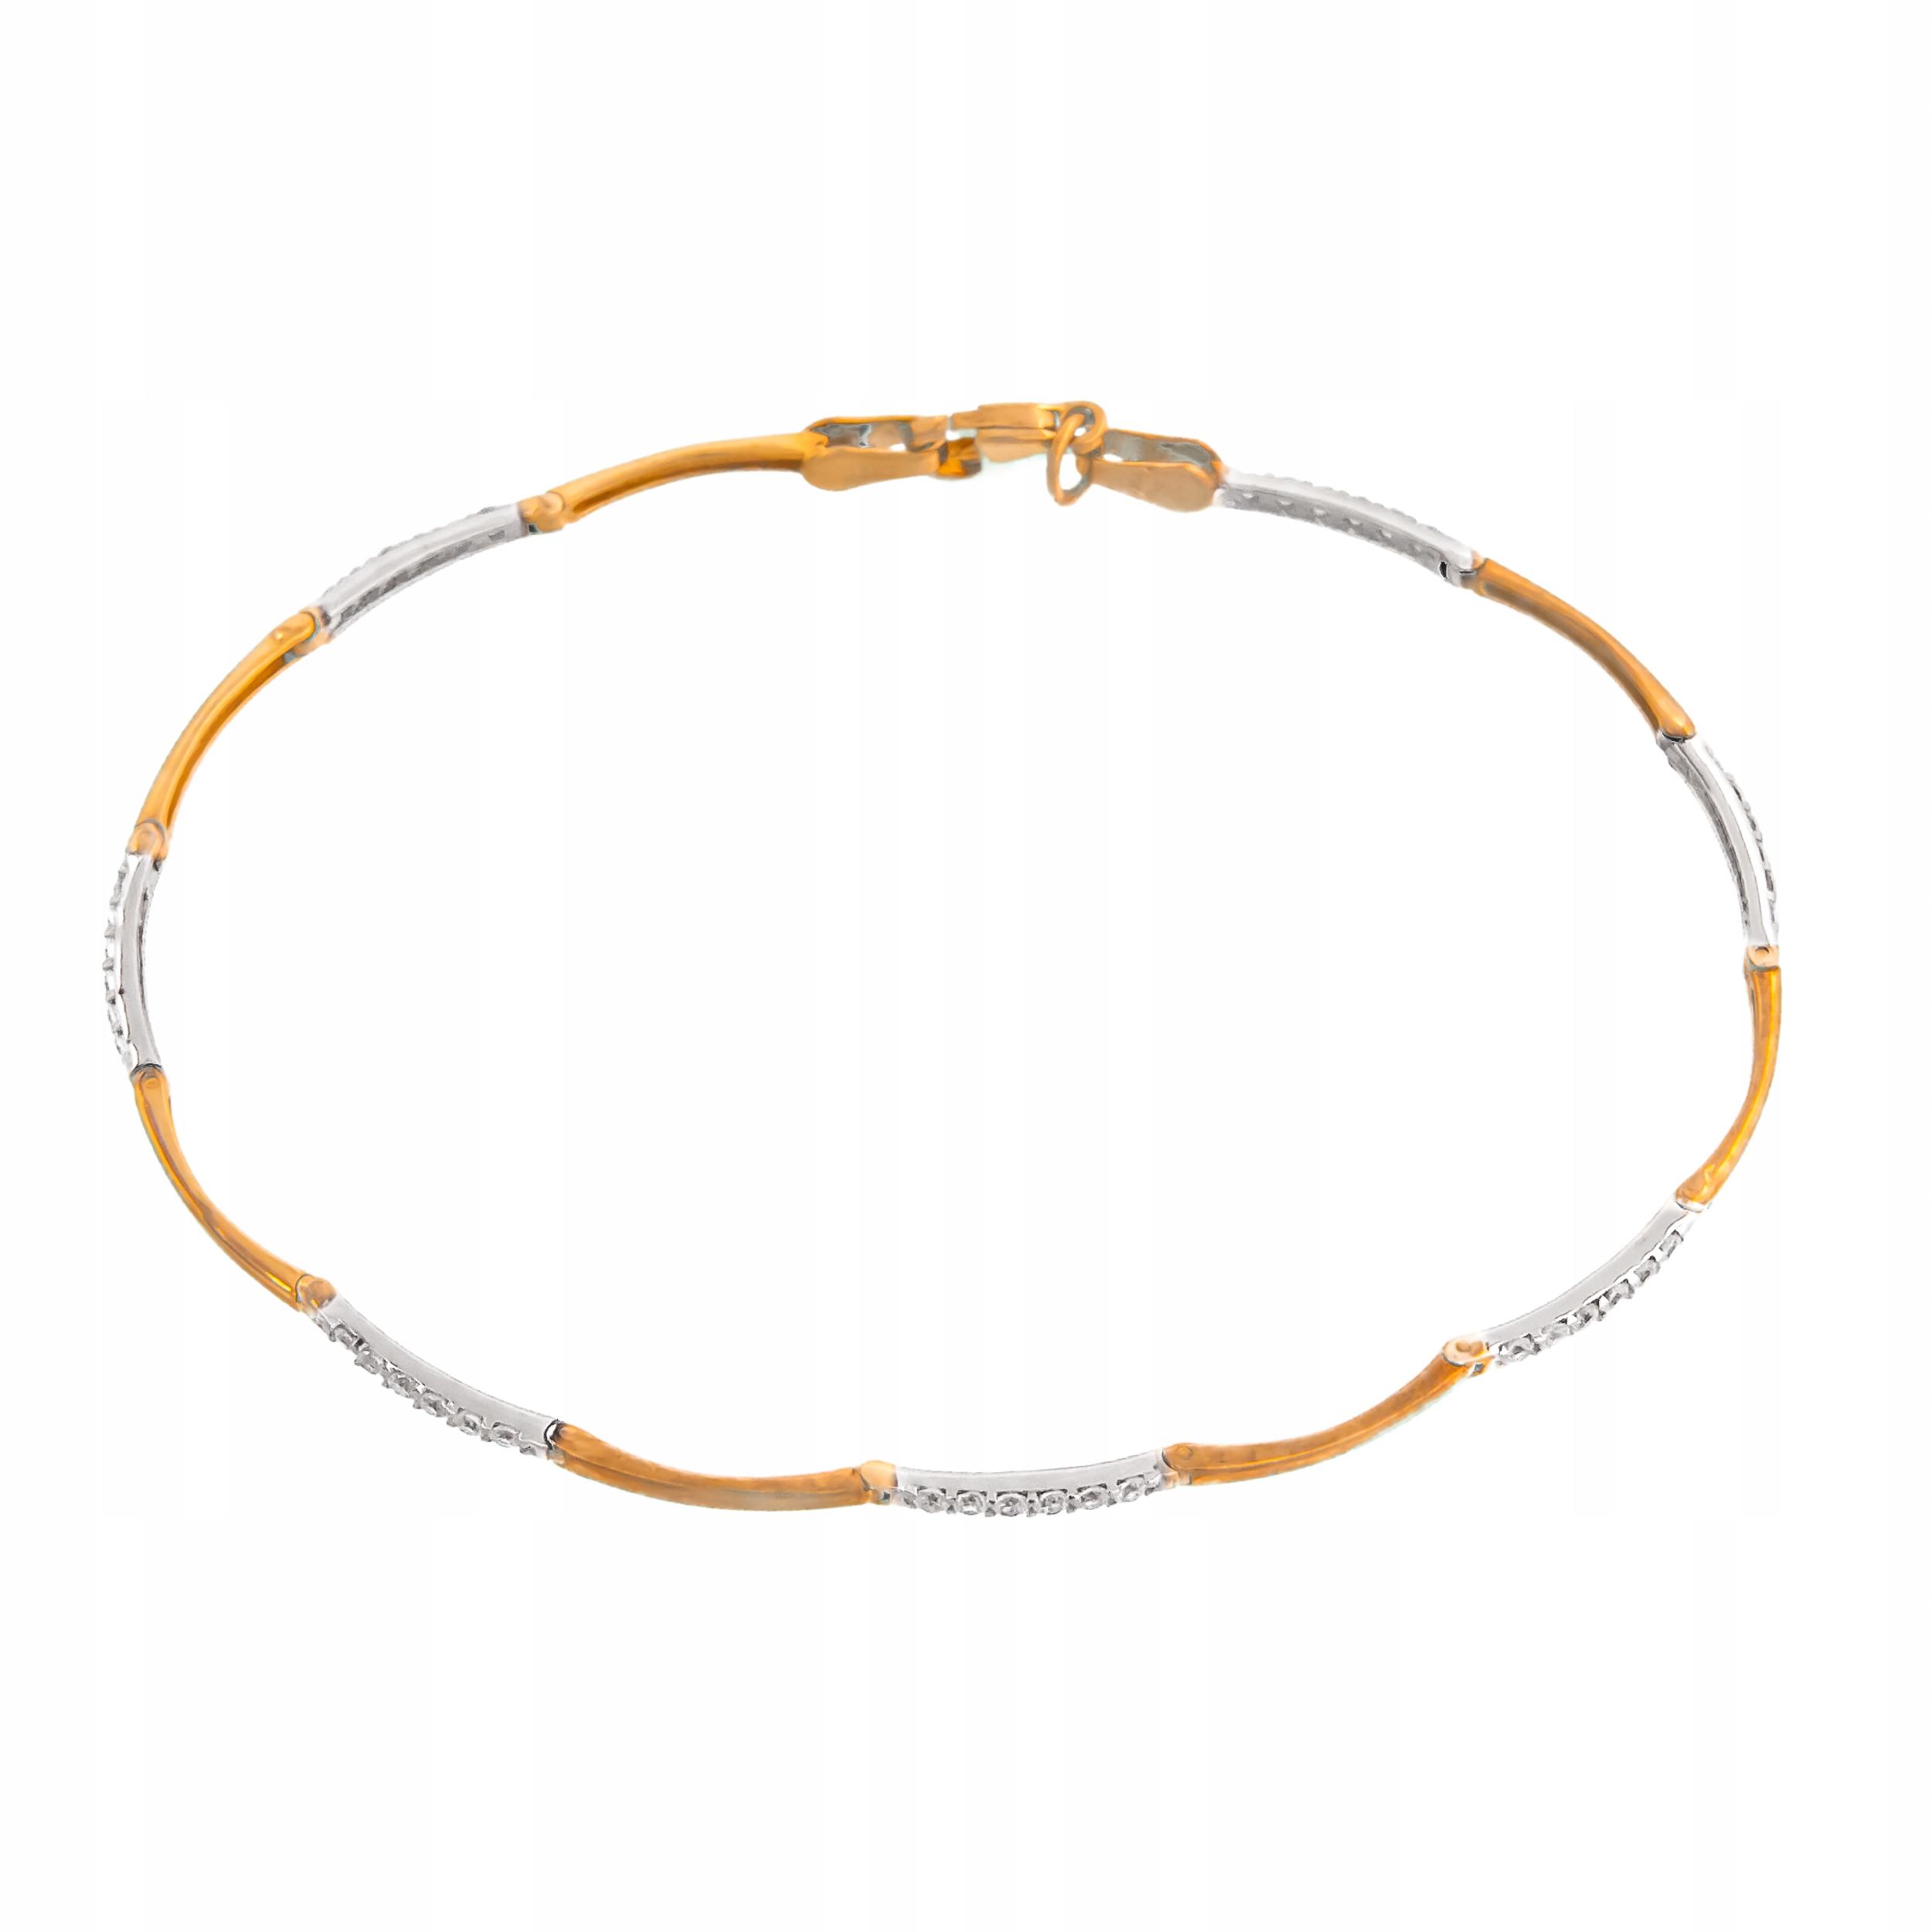 Zlatý Náramok 585 Biele Zlato Kamienkami RYTCA